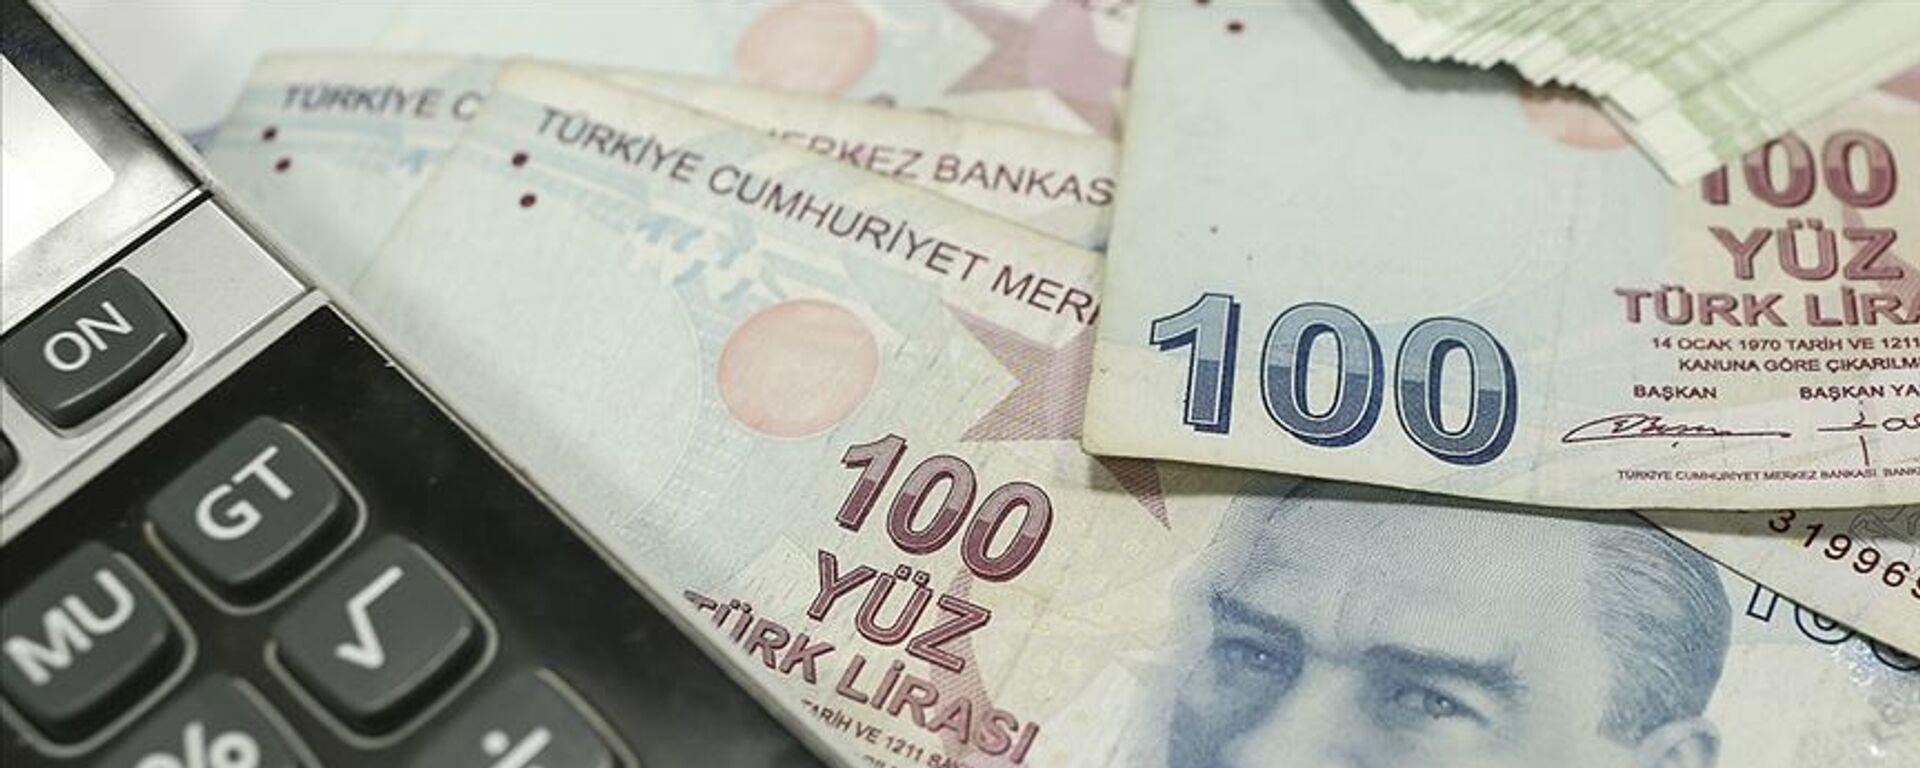 Hesap makinesi para TL - Sputnik Türkiye, 1920, 05.07.2021